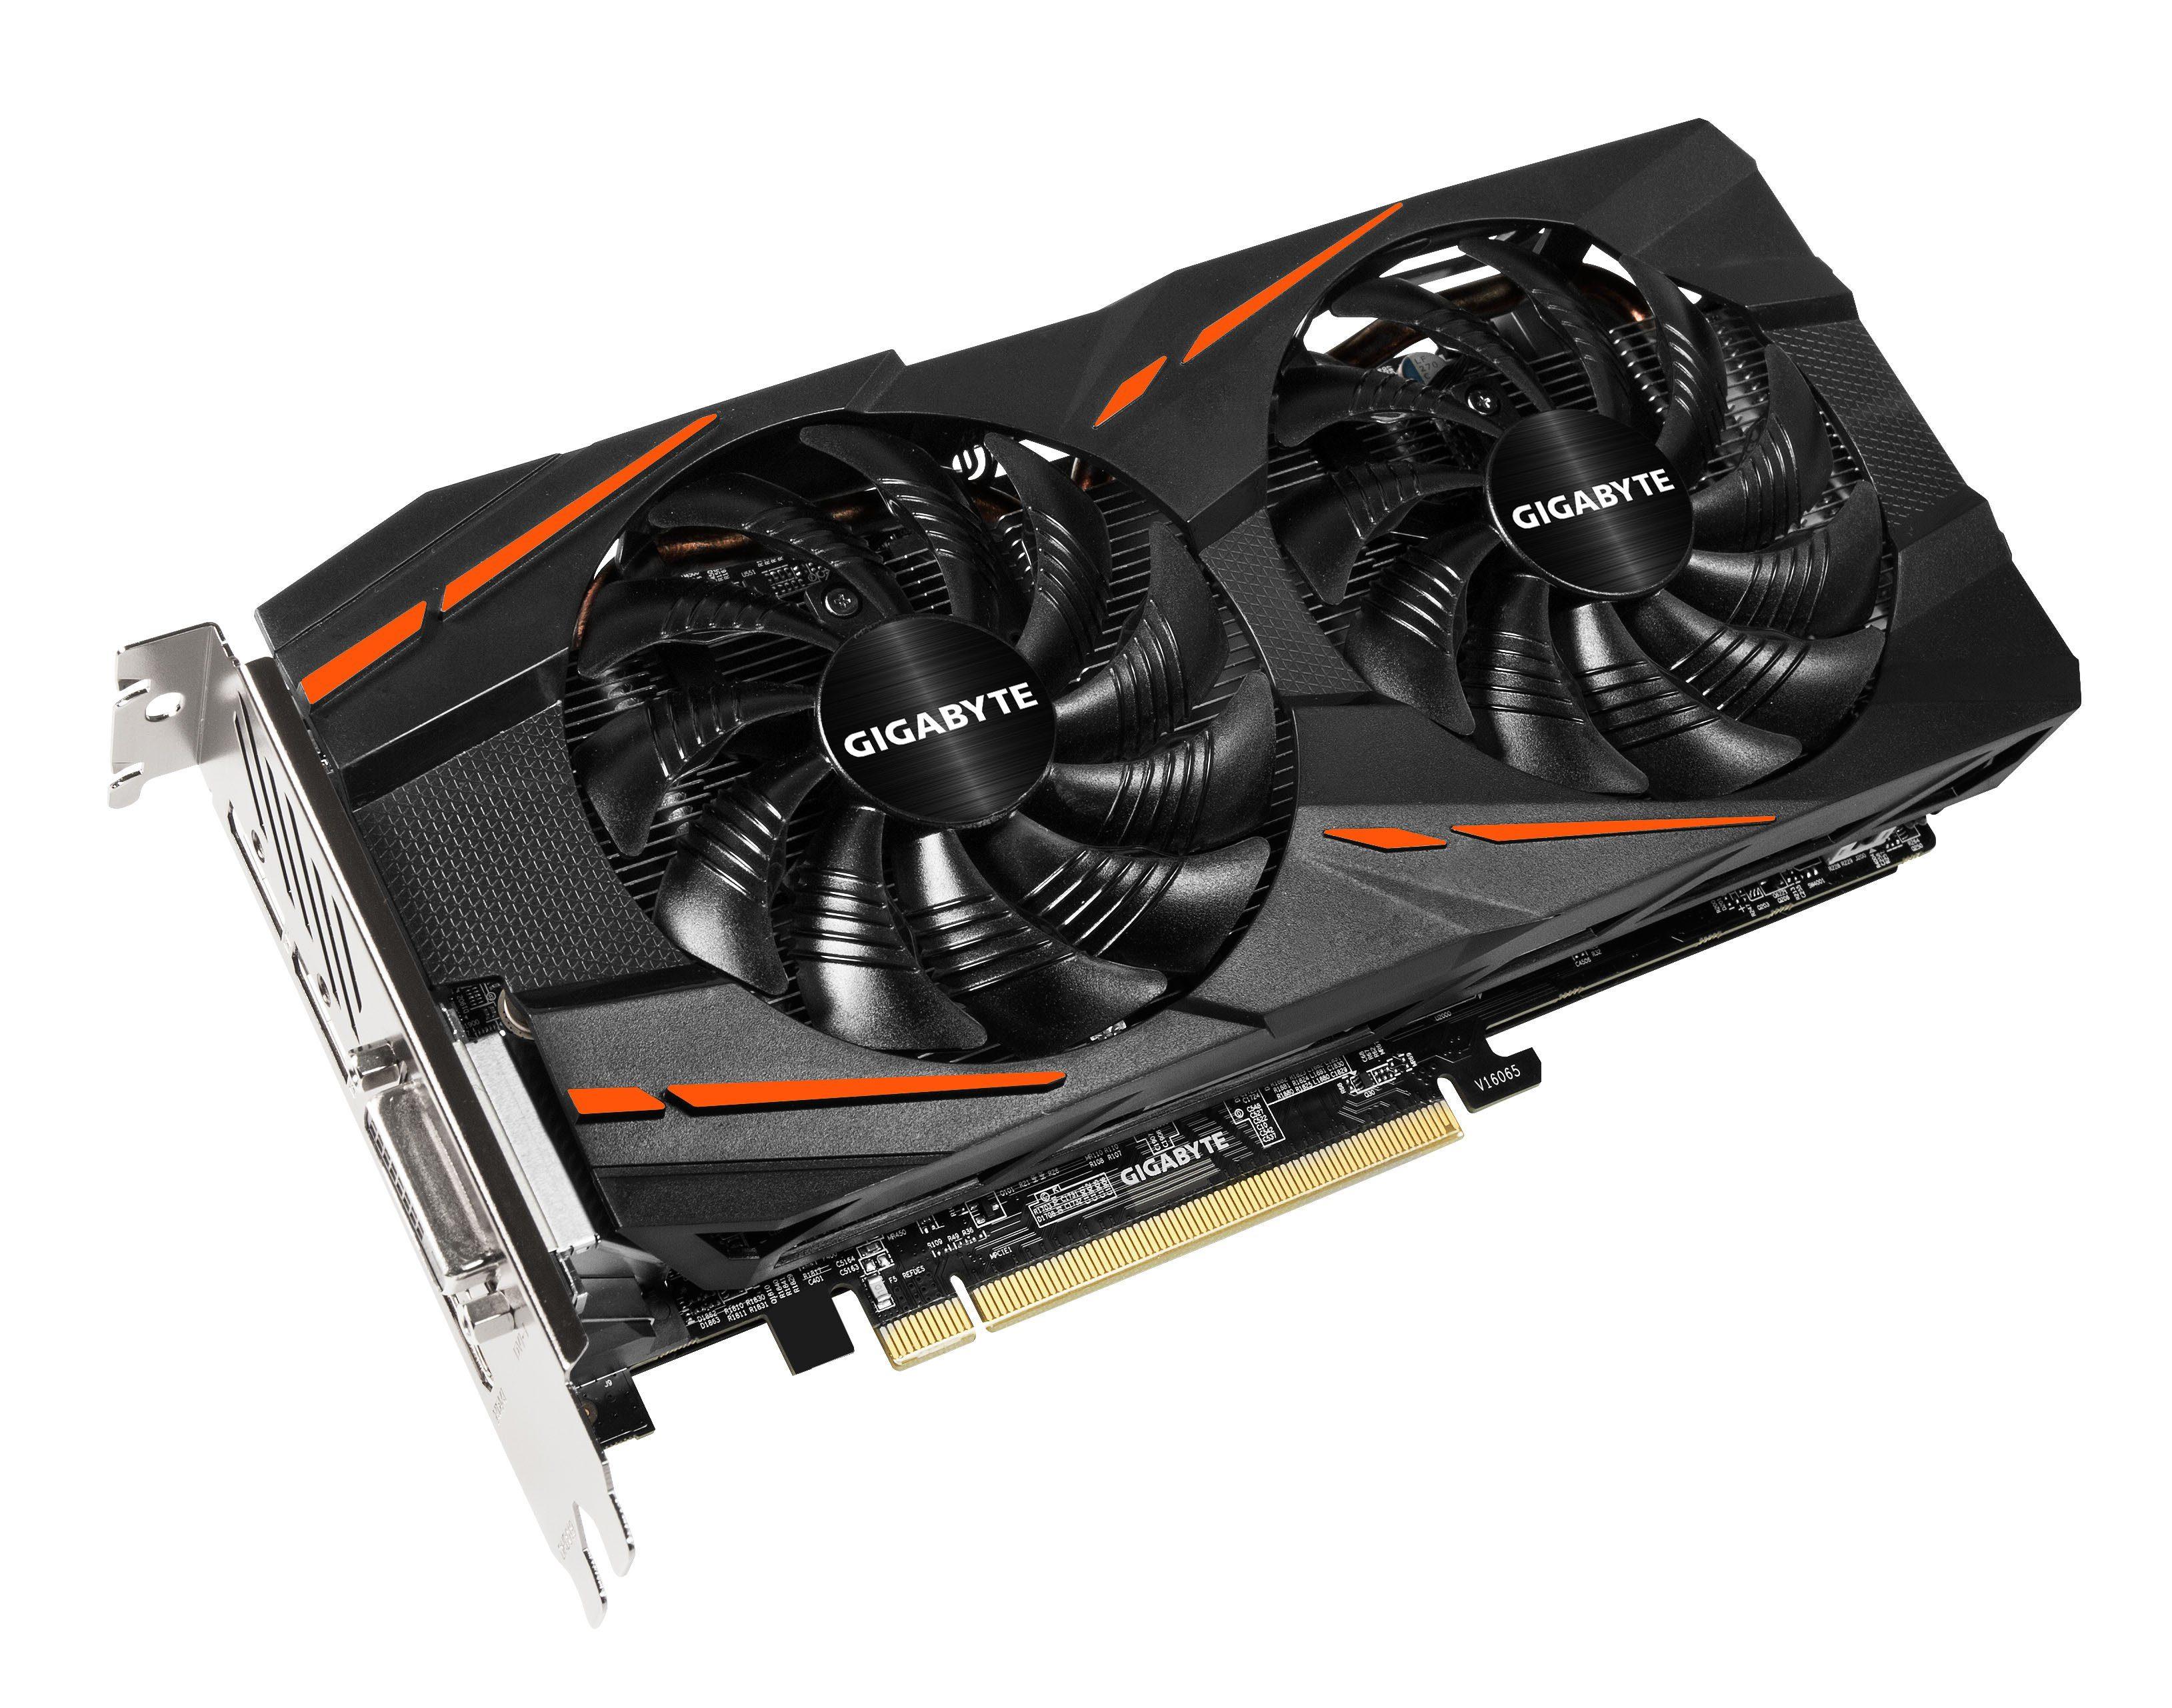 GIGABYTE Grafikkarte AMD Radeon™ RX570 Gaming 4GB GDDR5 256Bit »GV-RX570GAMING-4GD«